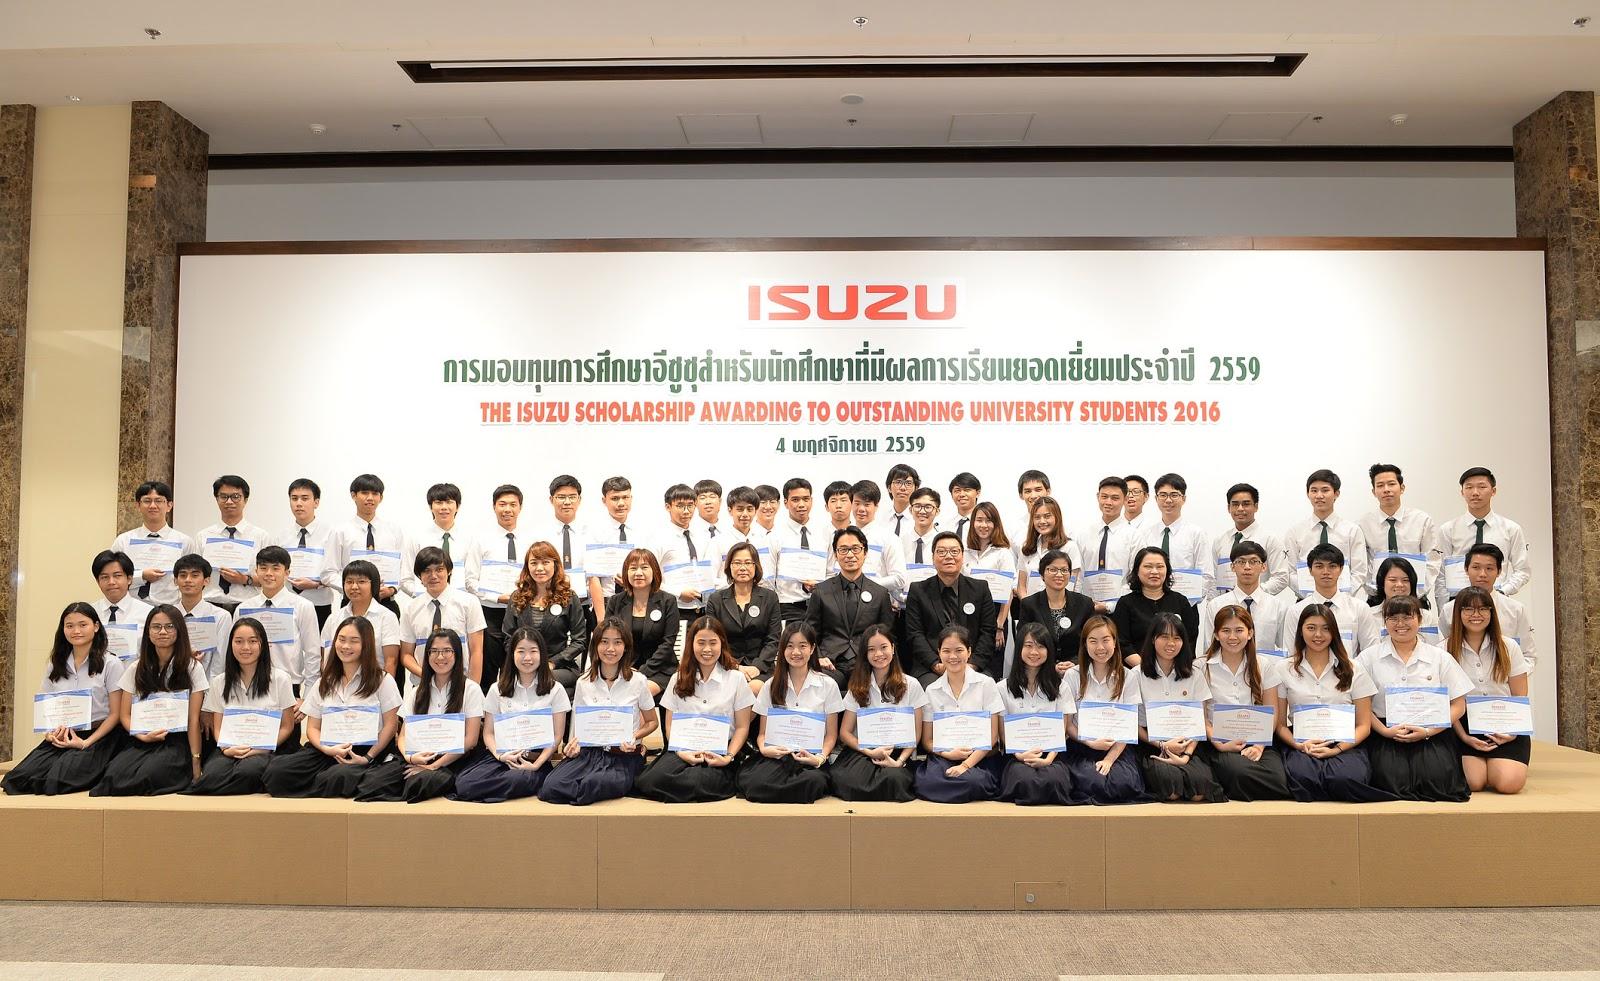 http://www.bangkokexpress.net/news/education